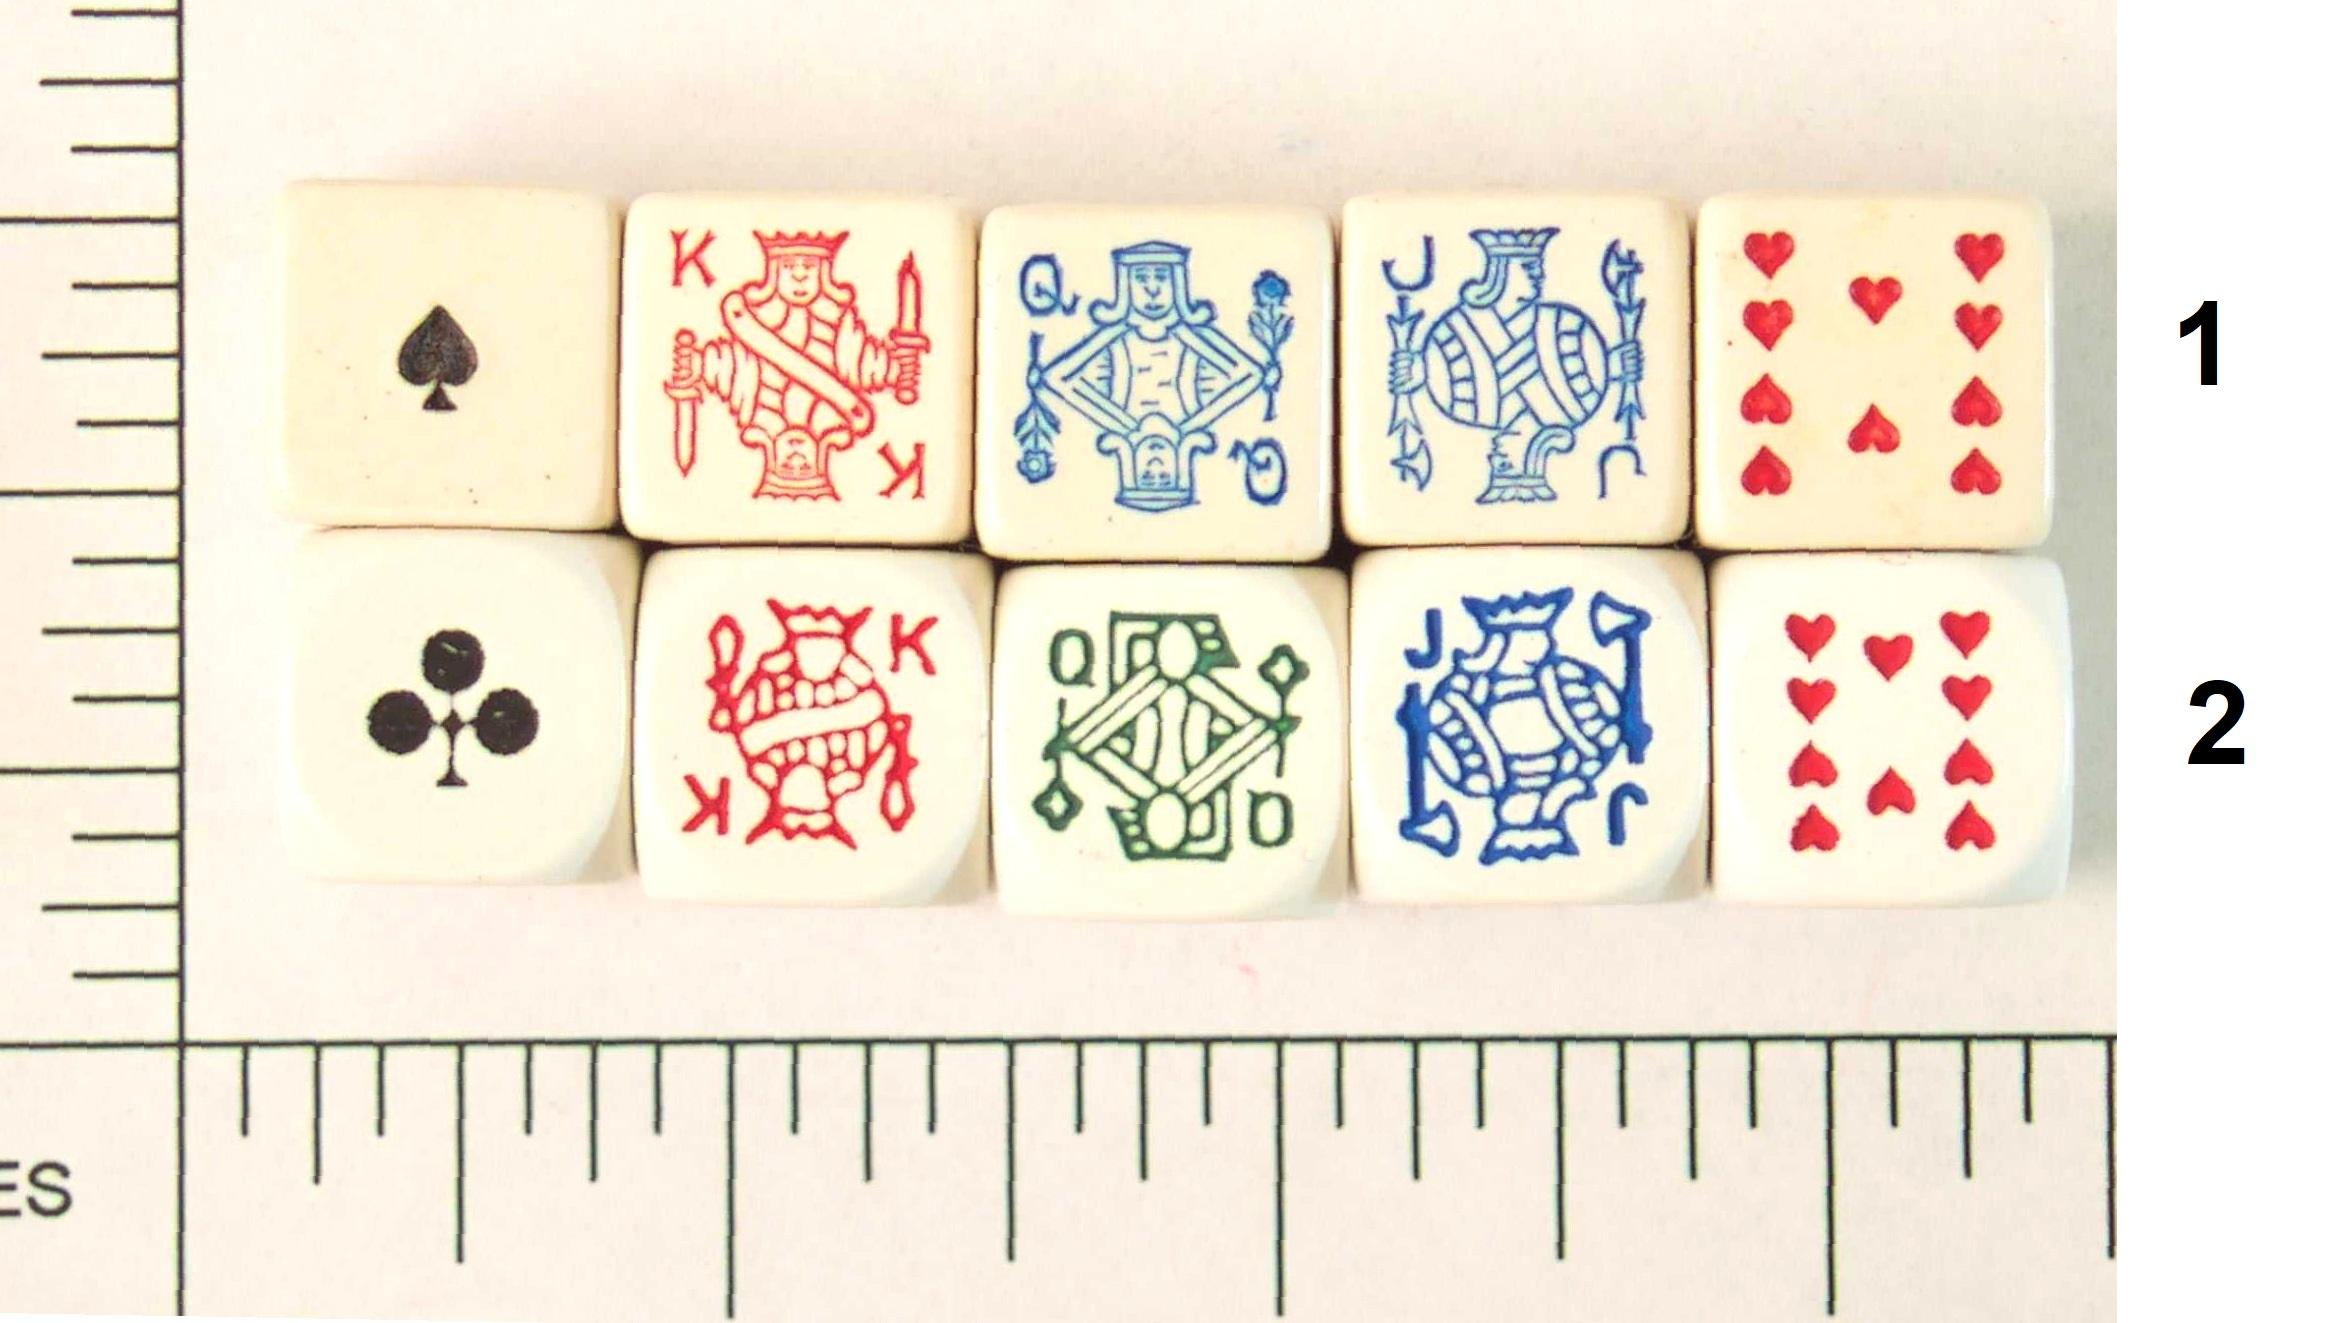 Chula vista poker